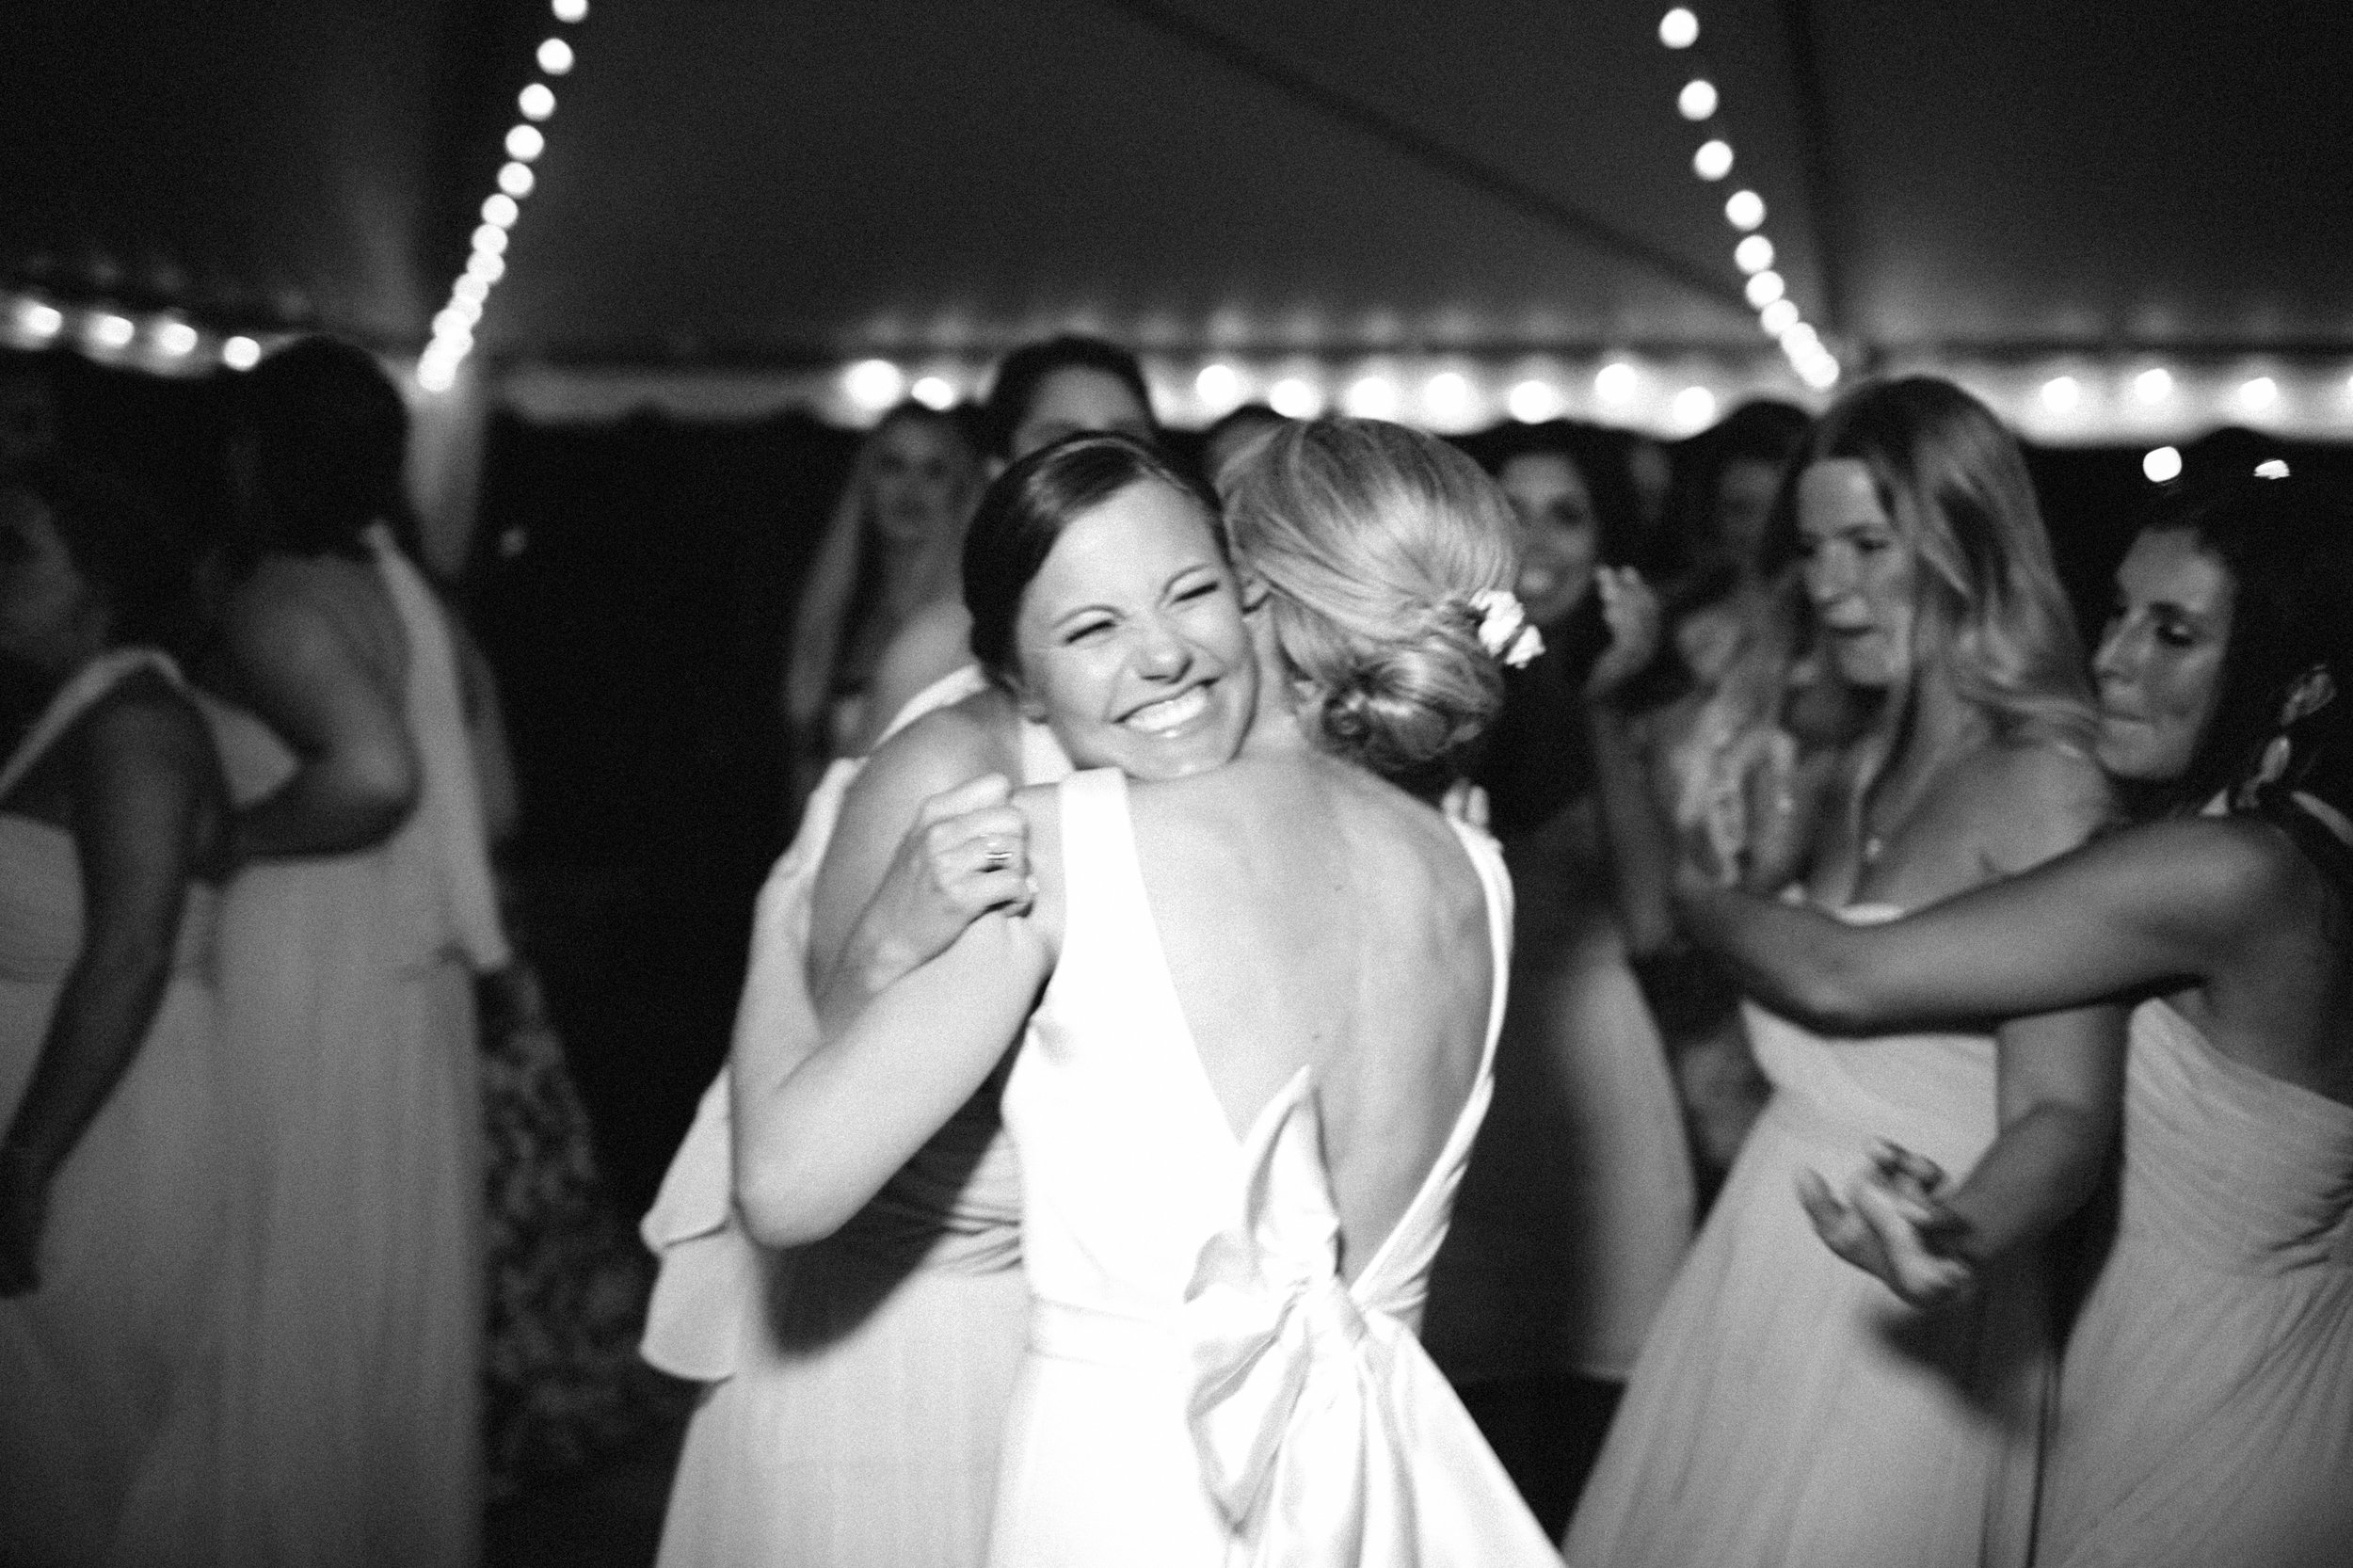 Olivia_Patrick_Wedding_Quarry_Venue_Abigail_Malone_Photography_Knoxville-951.jpg